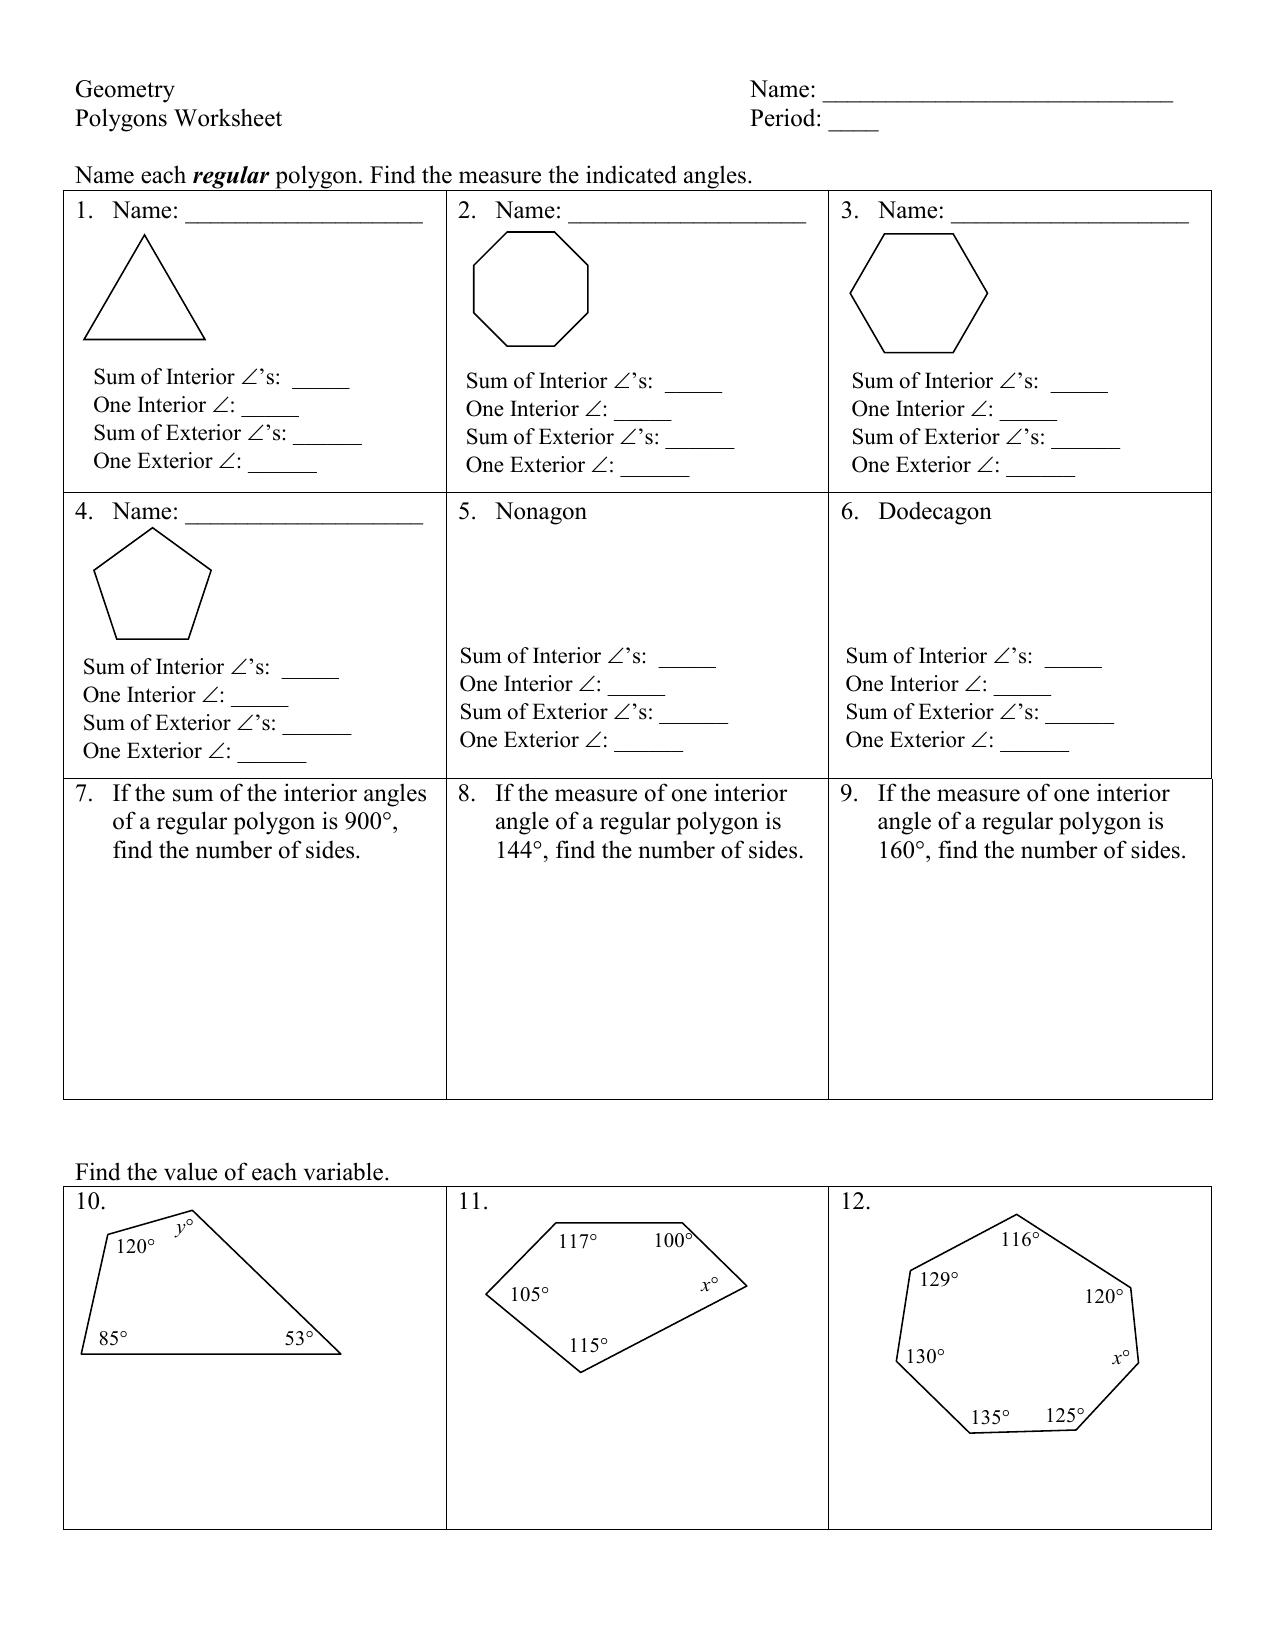 Geometry Name Polygons Worksheet Period Name Each